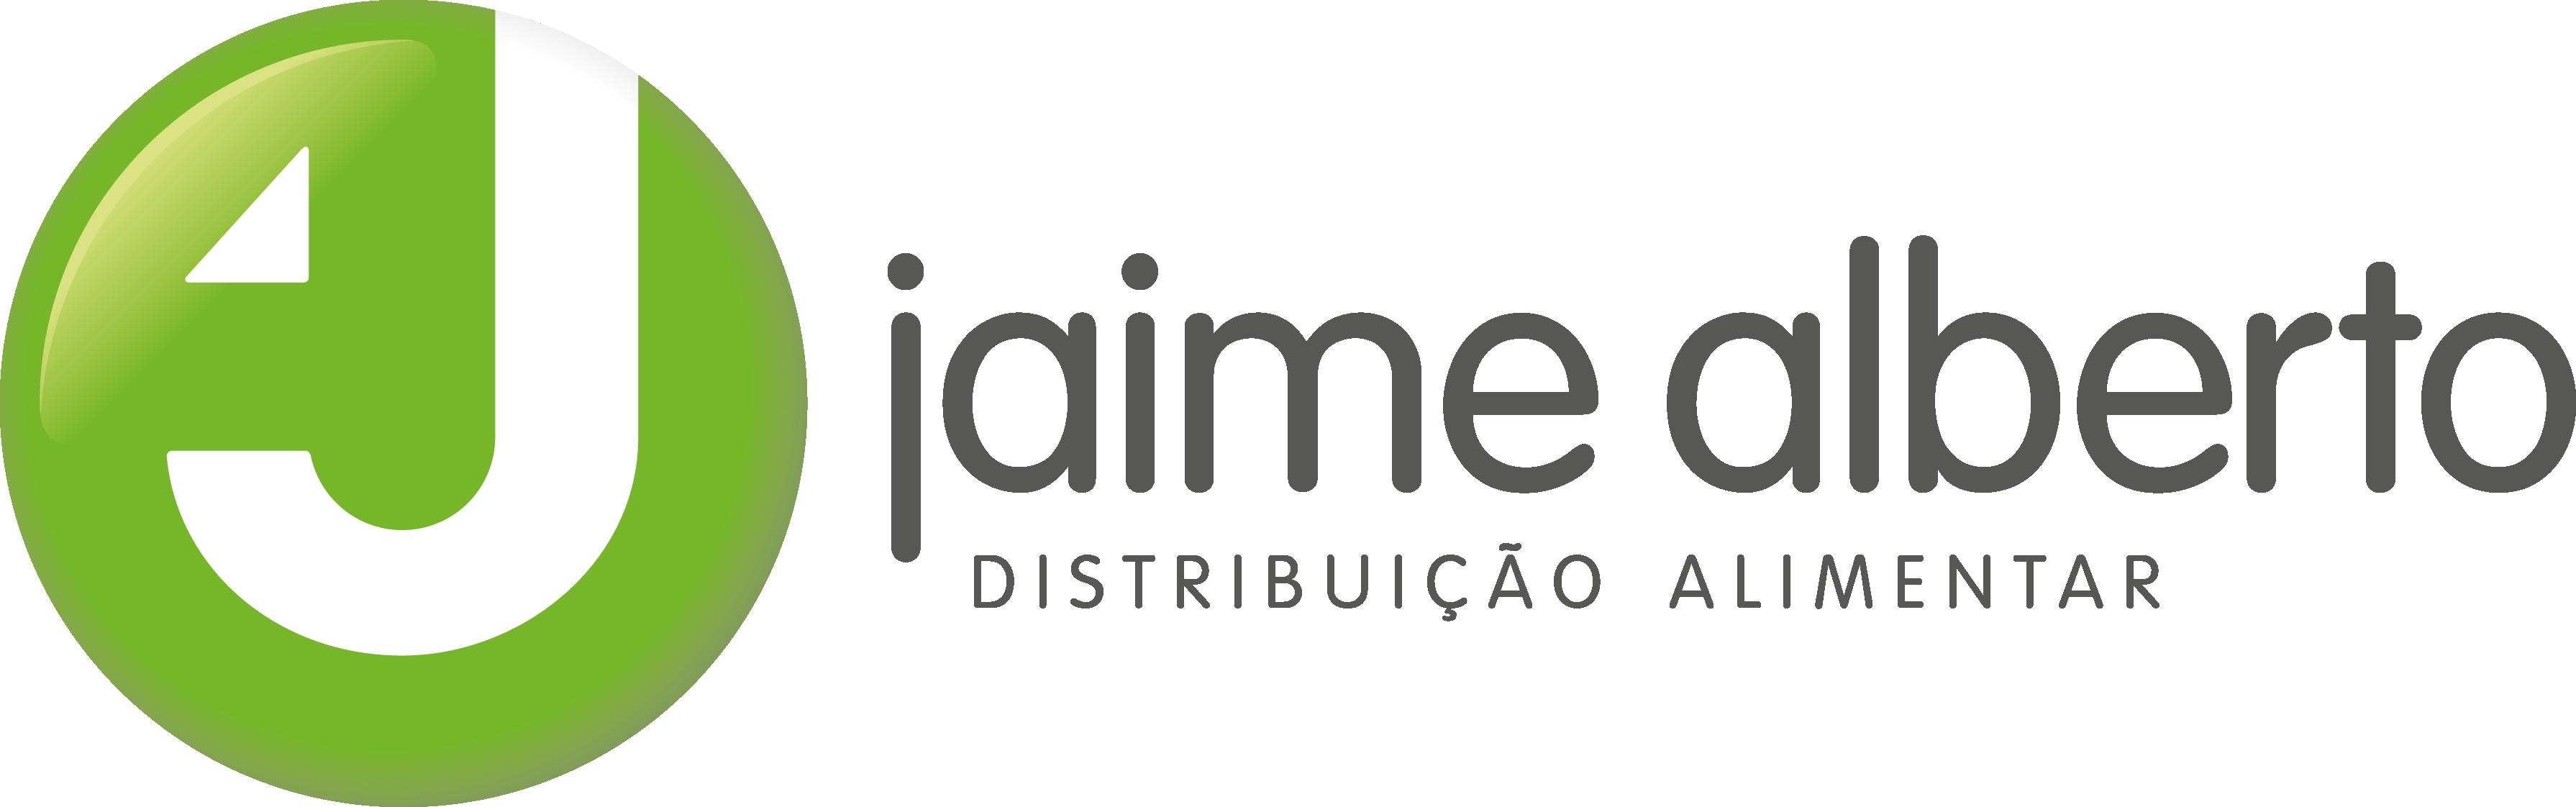 Jaime Alberto - Distribuição Alimentar